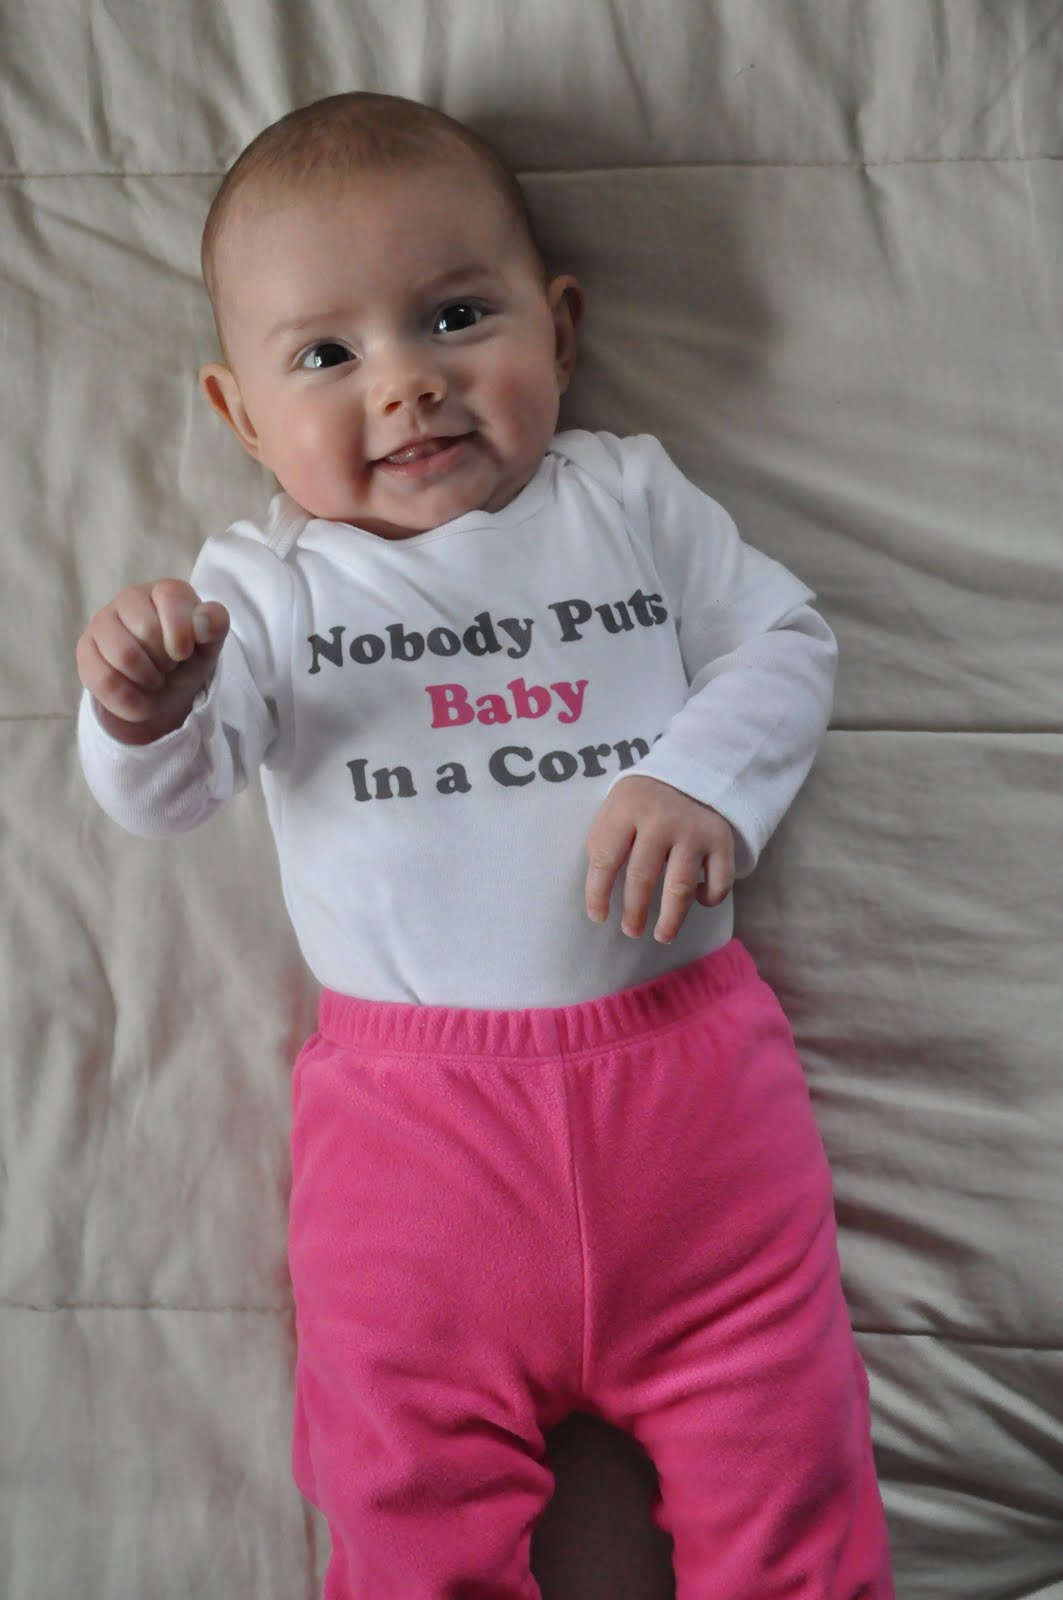 Cape Cod Makeover: Nobody Puts Baby In A Corner